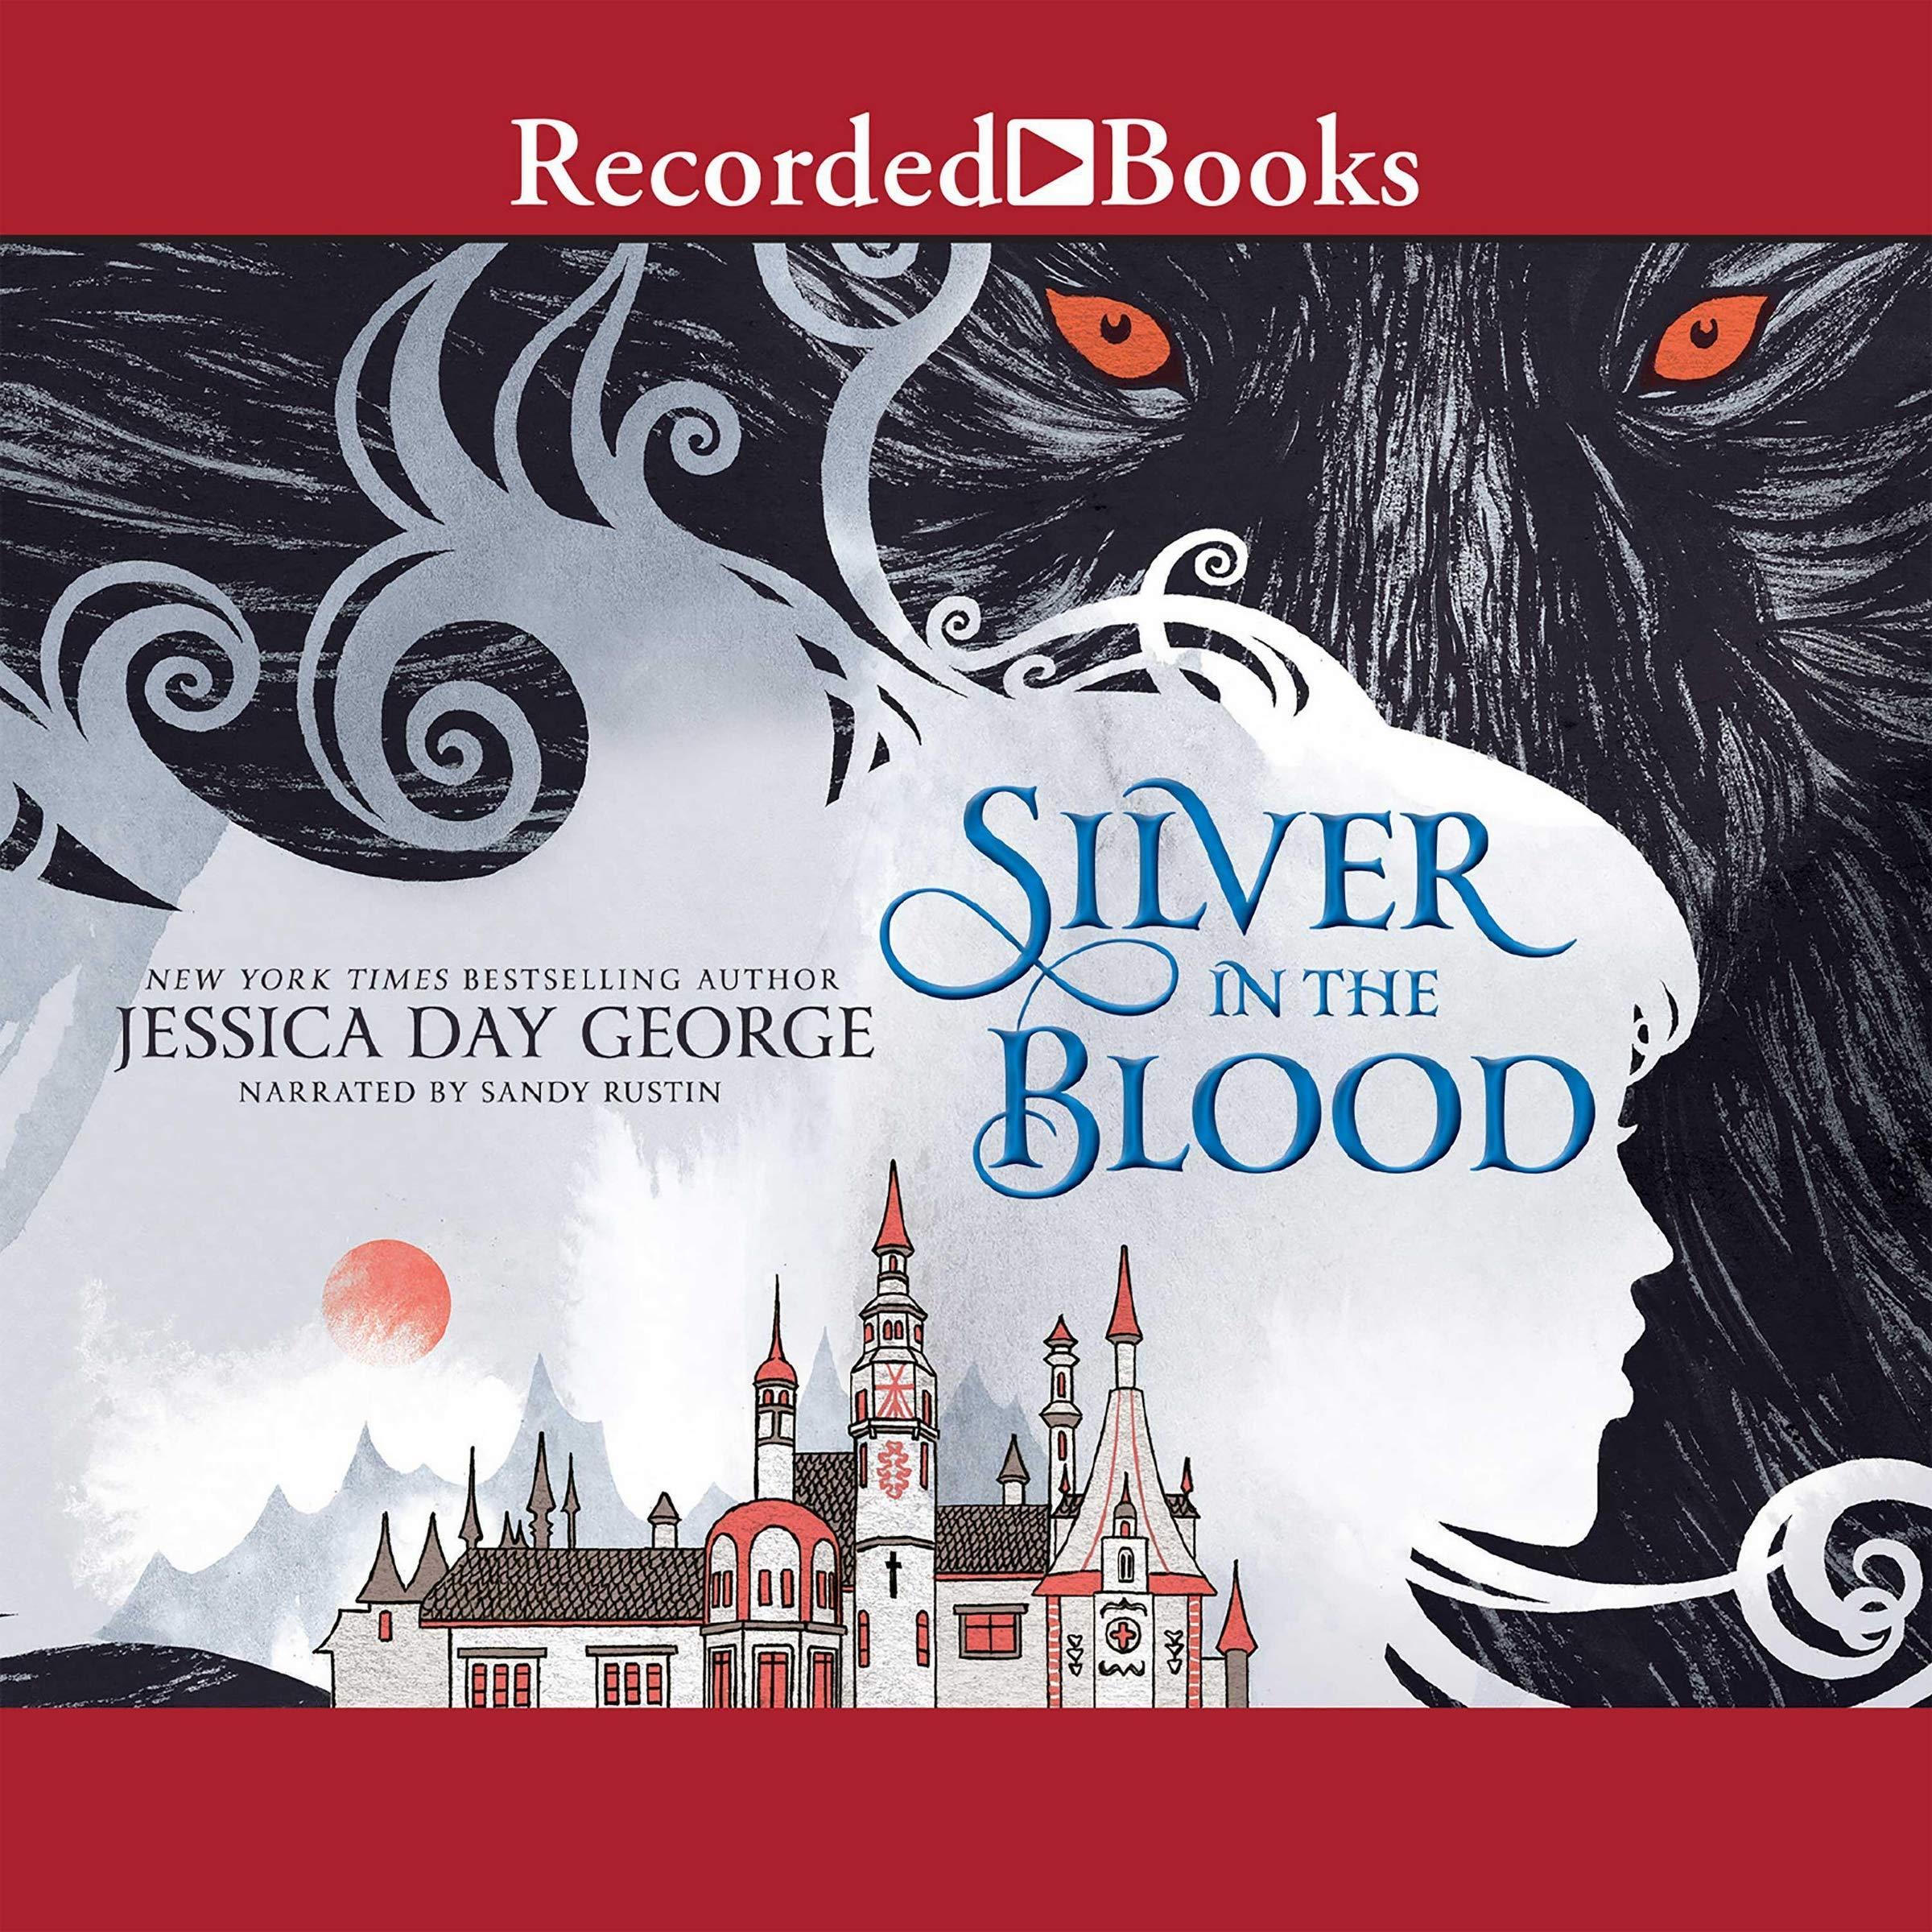 Silver in the Blood (The Silver in the Blood Series)